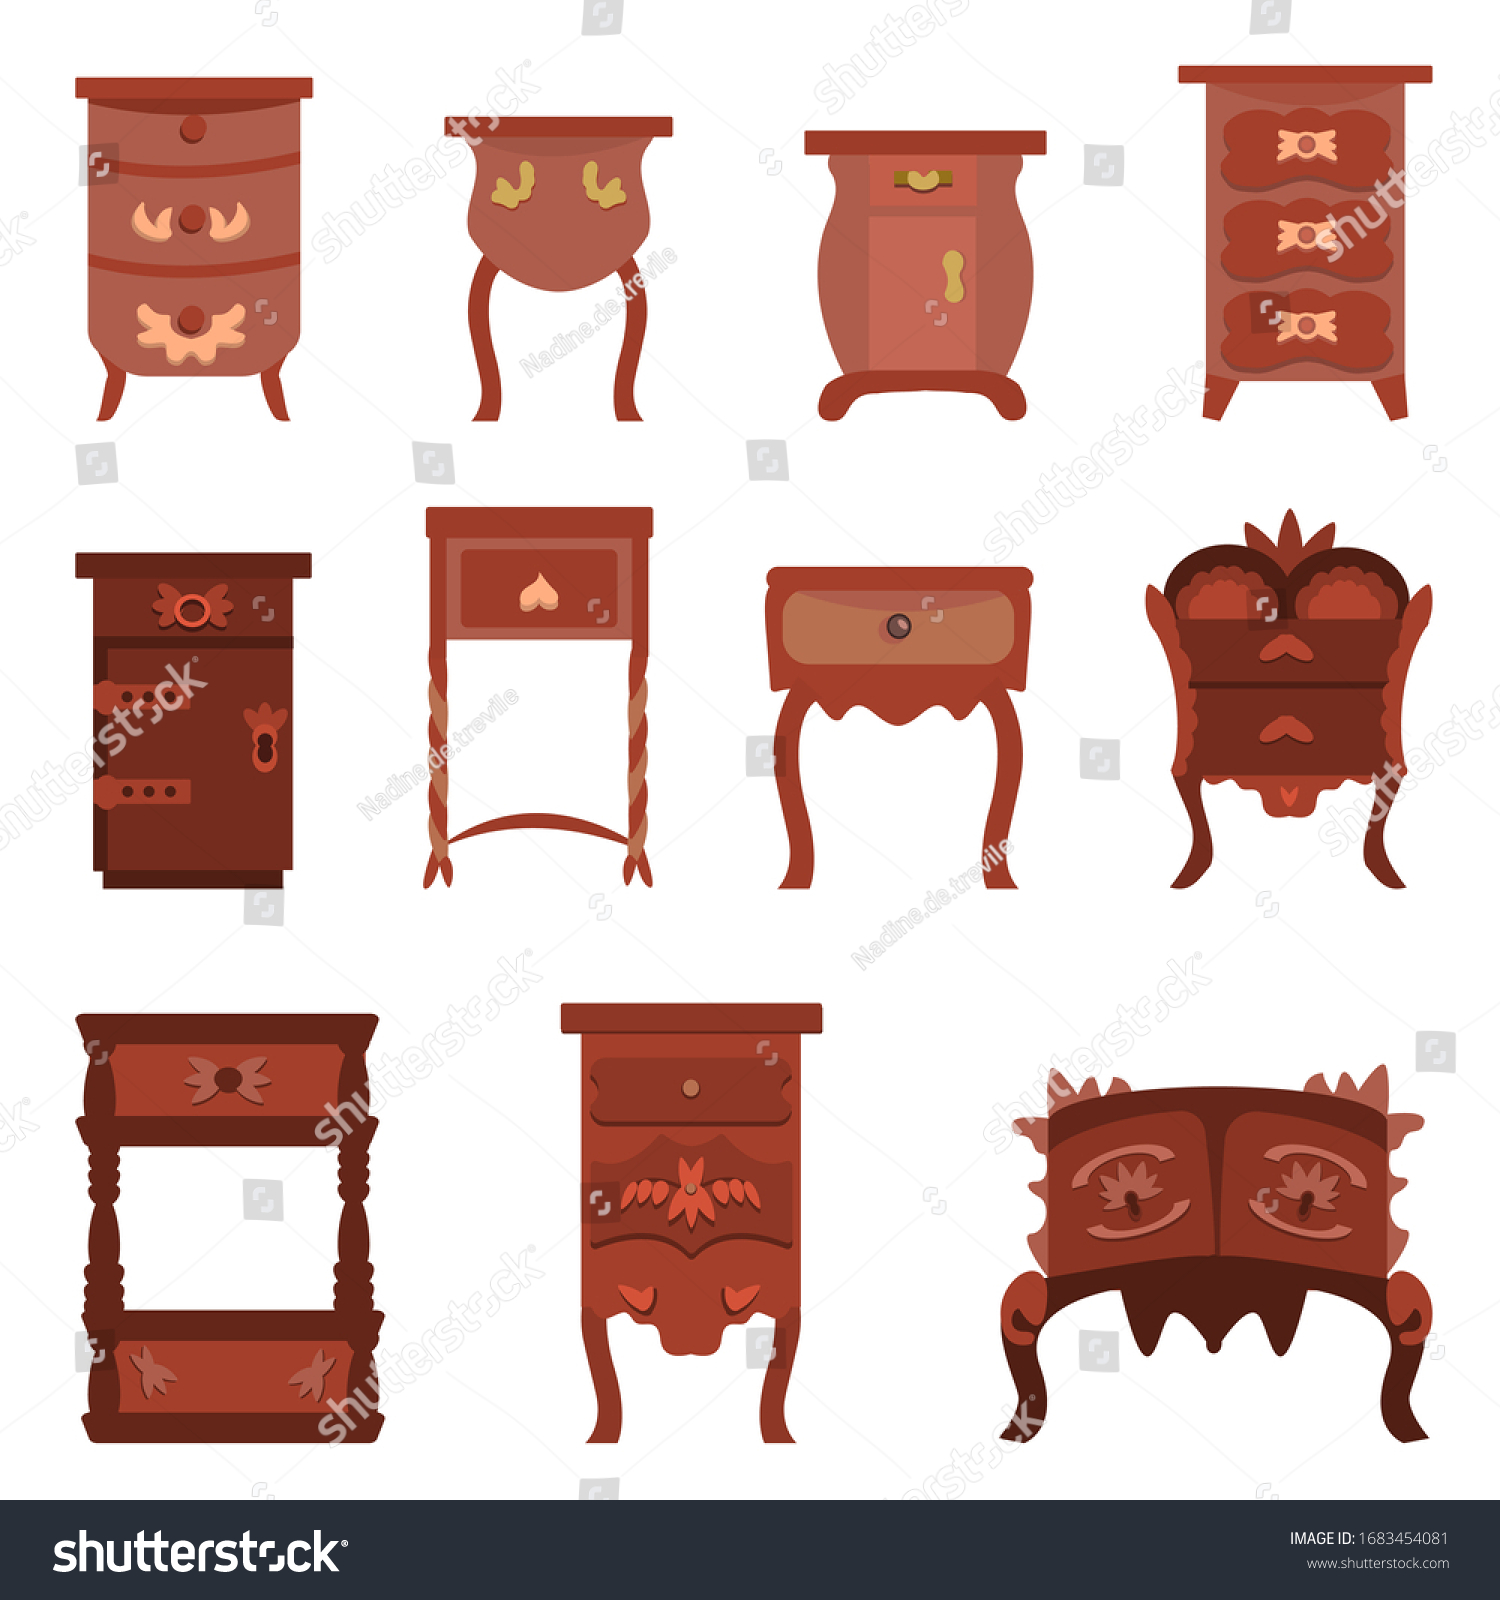 Set Cute Vintage Nightstands Dressers Bureaus Stock Vector Royalty Free 1683454081